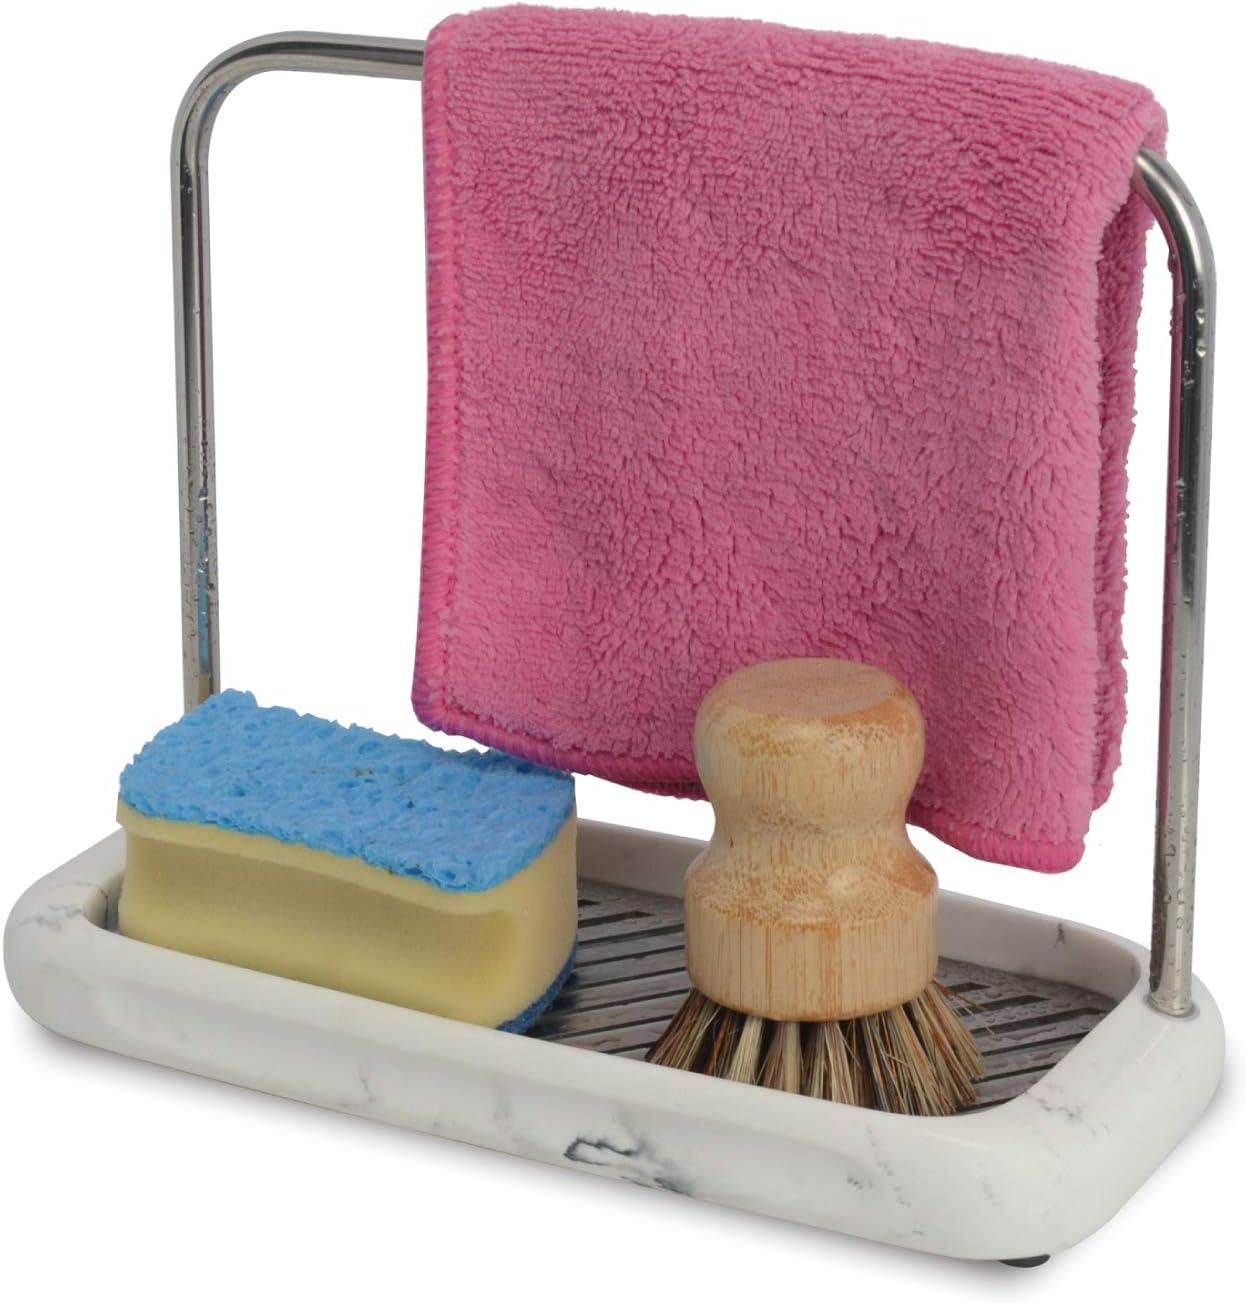 overseas ZCCZ Sponge Holder Dishcloth Max 50% OFF Hanger Caddy Tra Kitchen Rack Sink